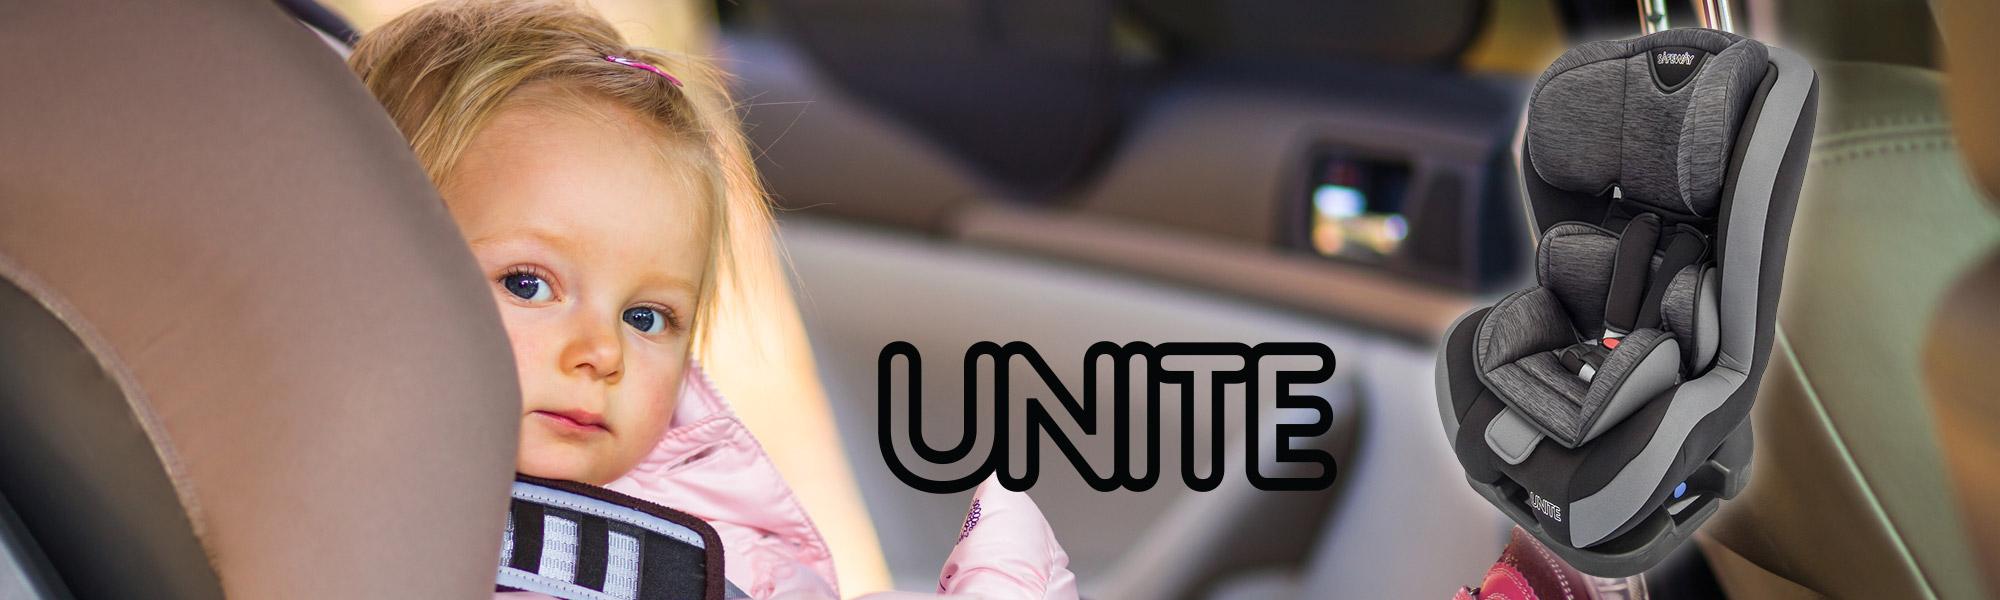 Unite-2000x600